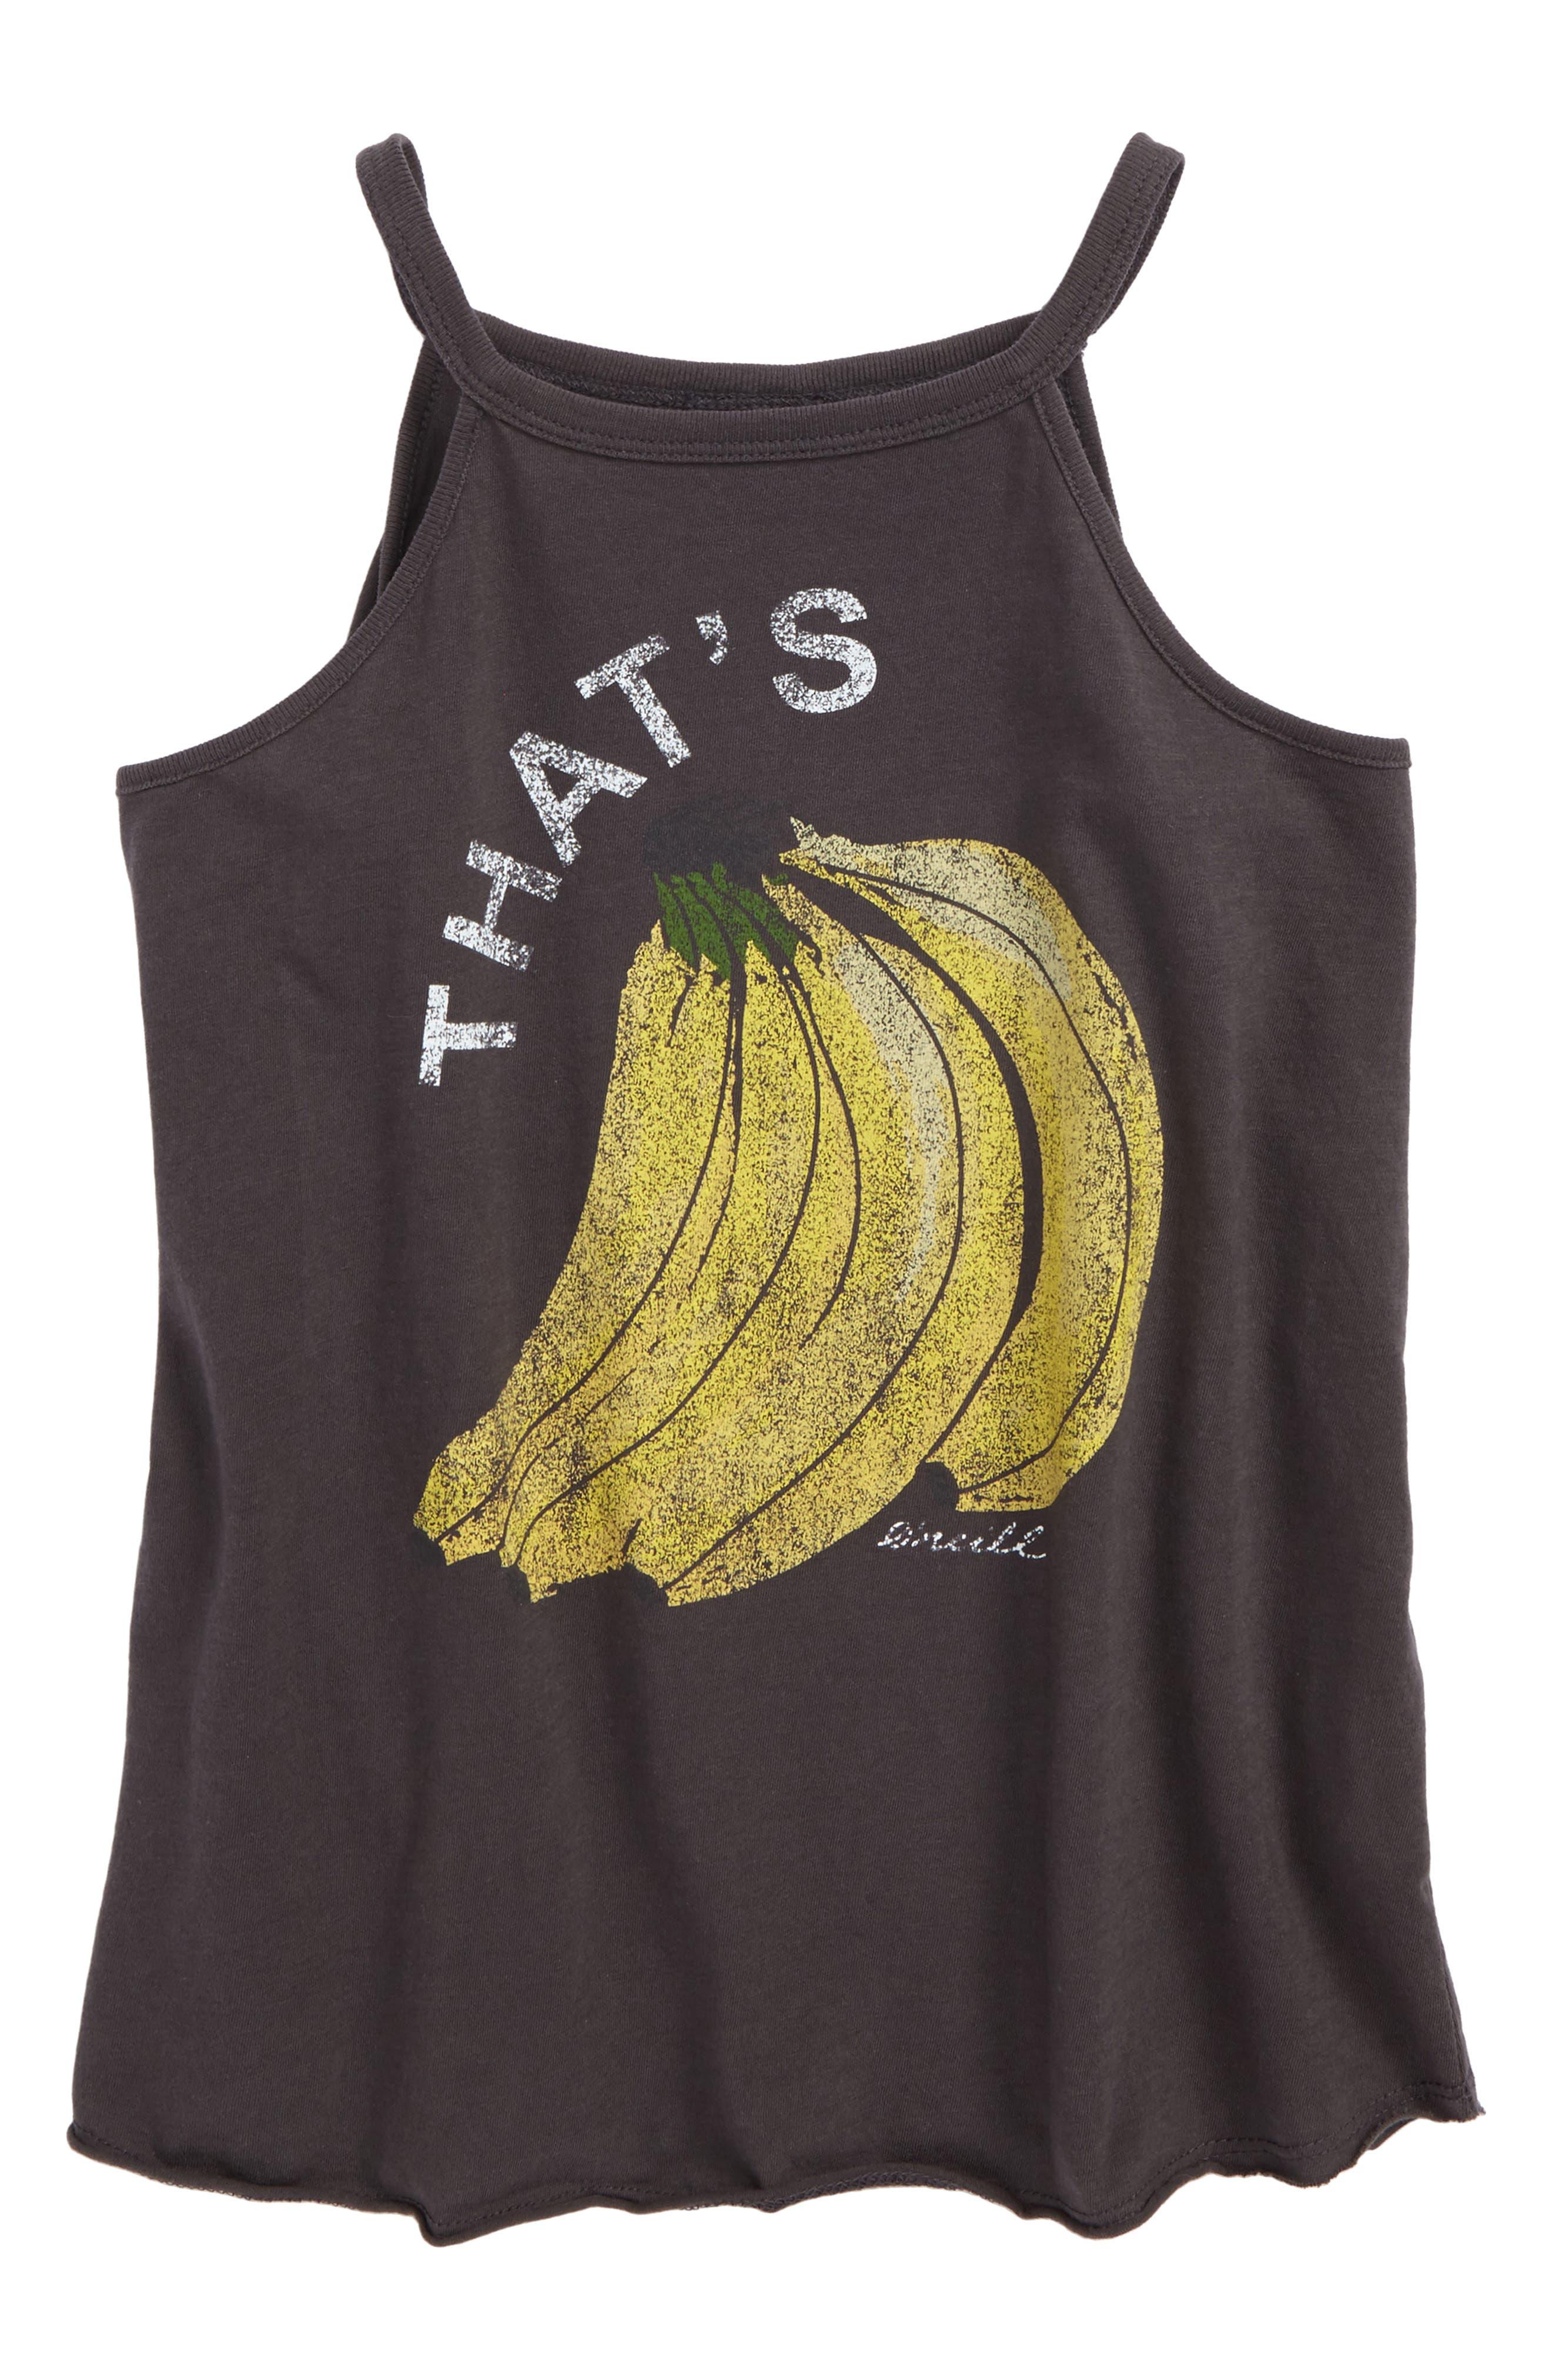 Main Image - O'Neill That's Bananas Graphic Tee (Big Girls)